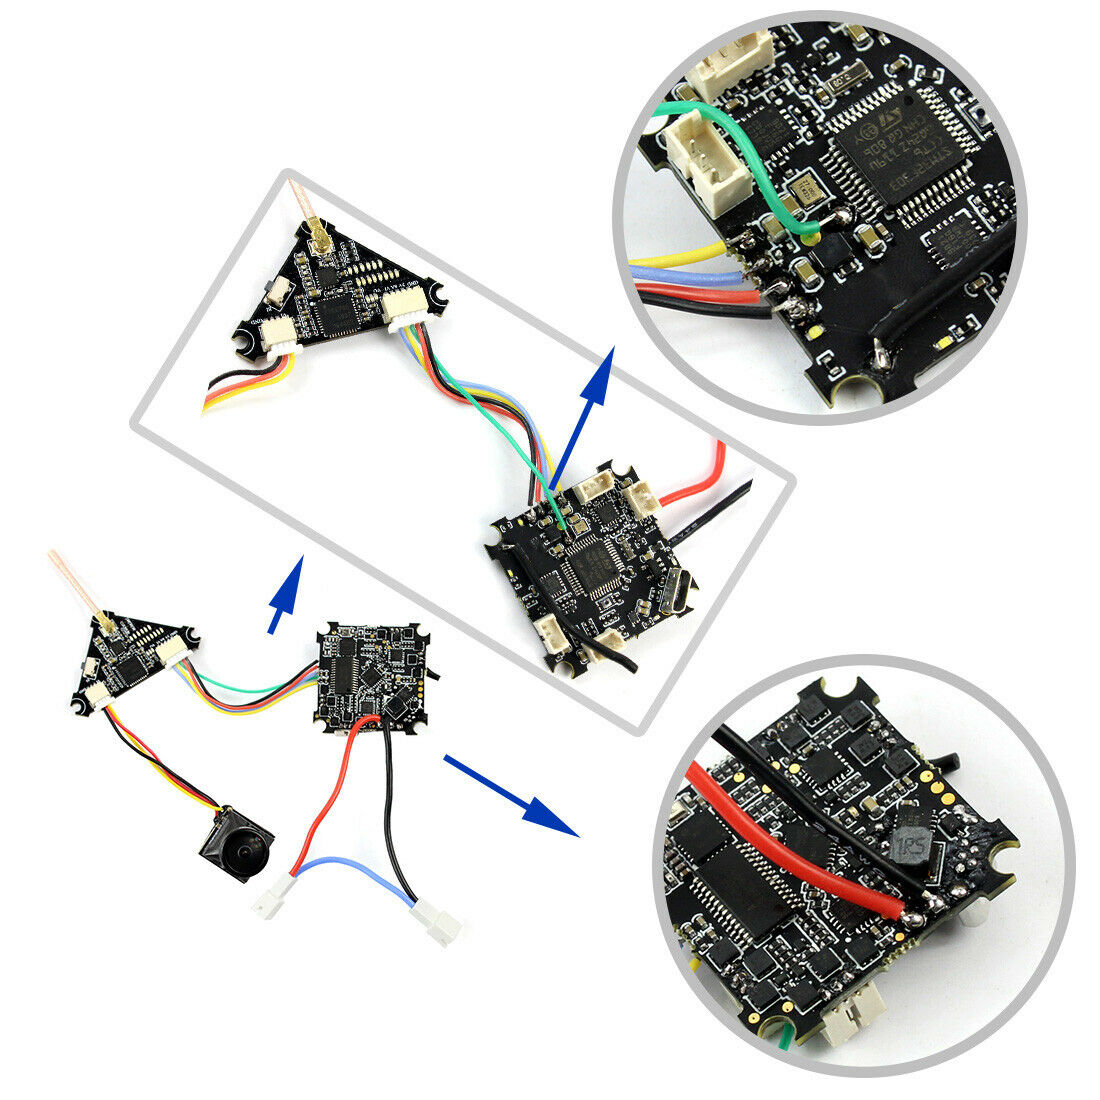 JMT 75mm V2 Crazybee F4 Pro OSD 2S FPV RC Racing Drone Caddx EOS2  Mini Camera